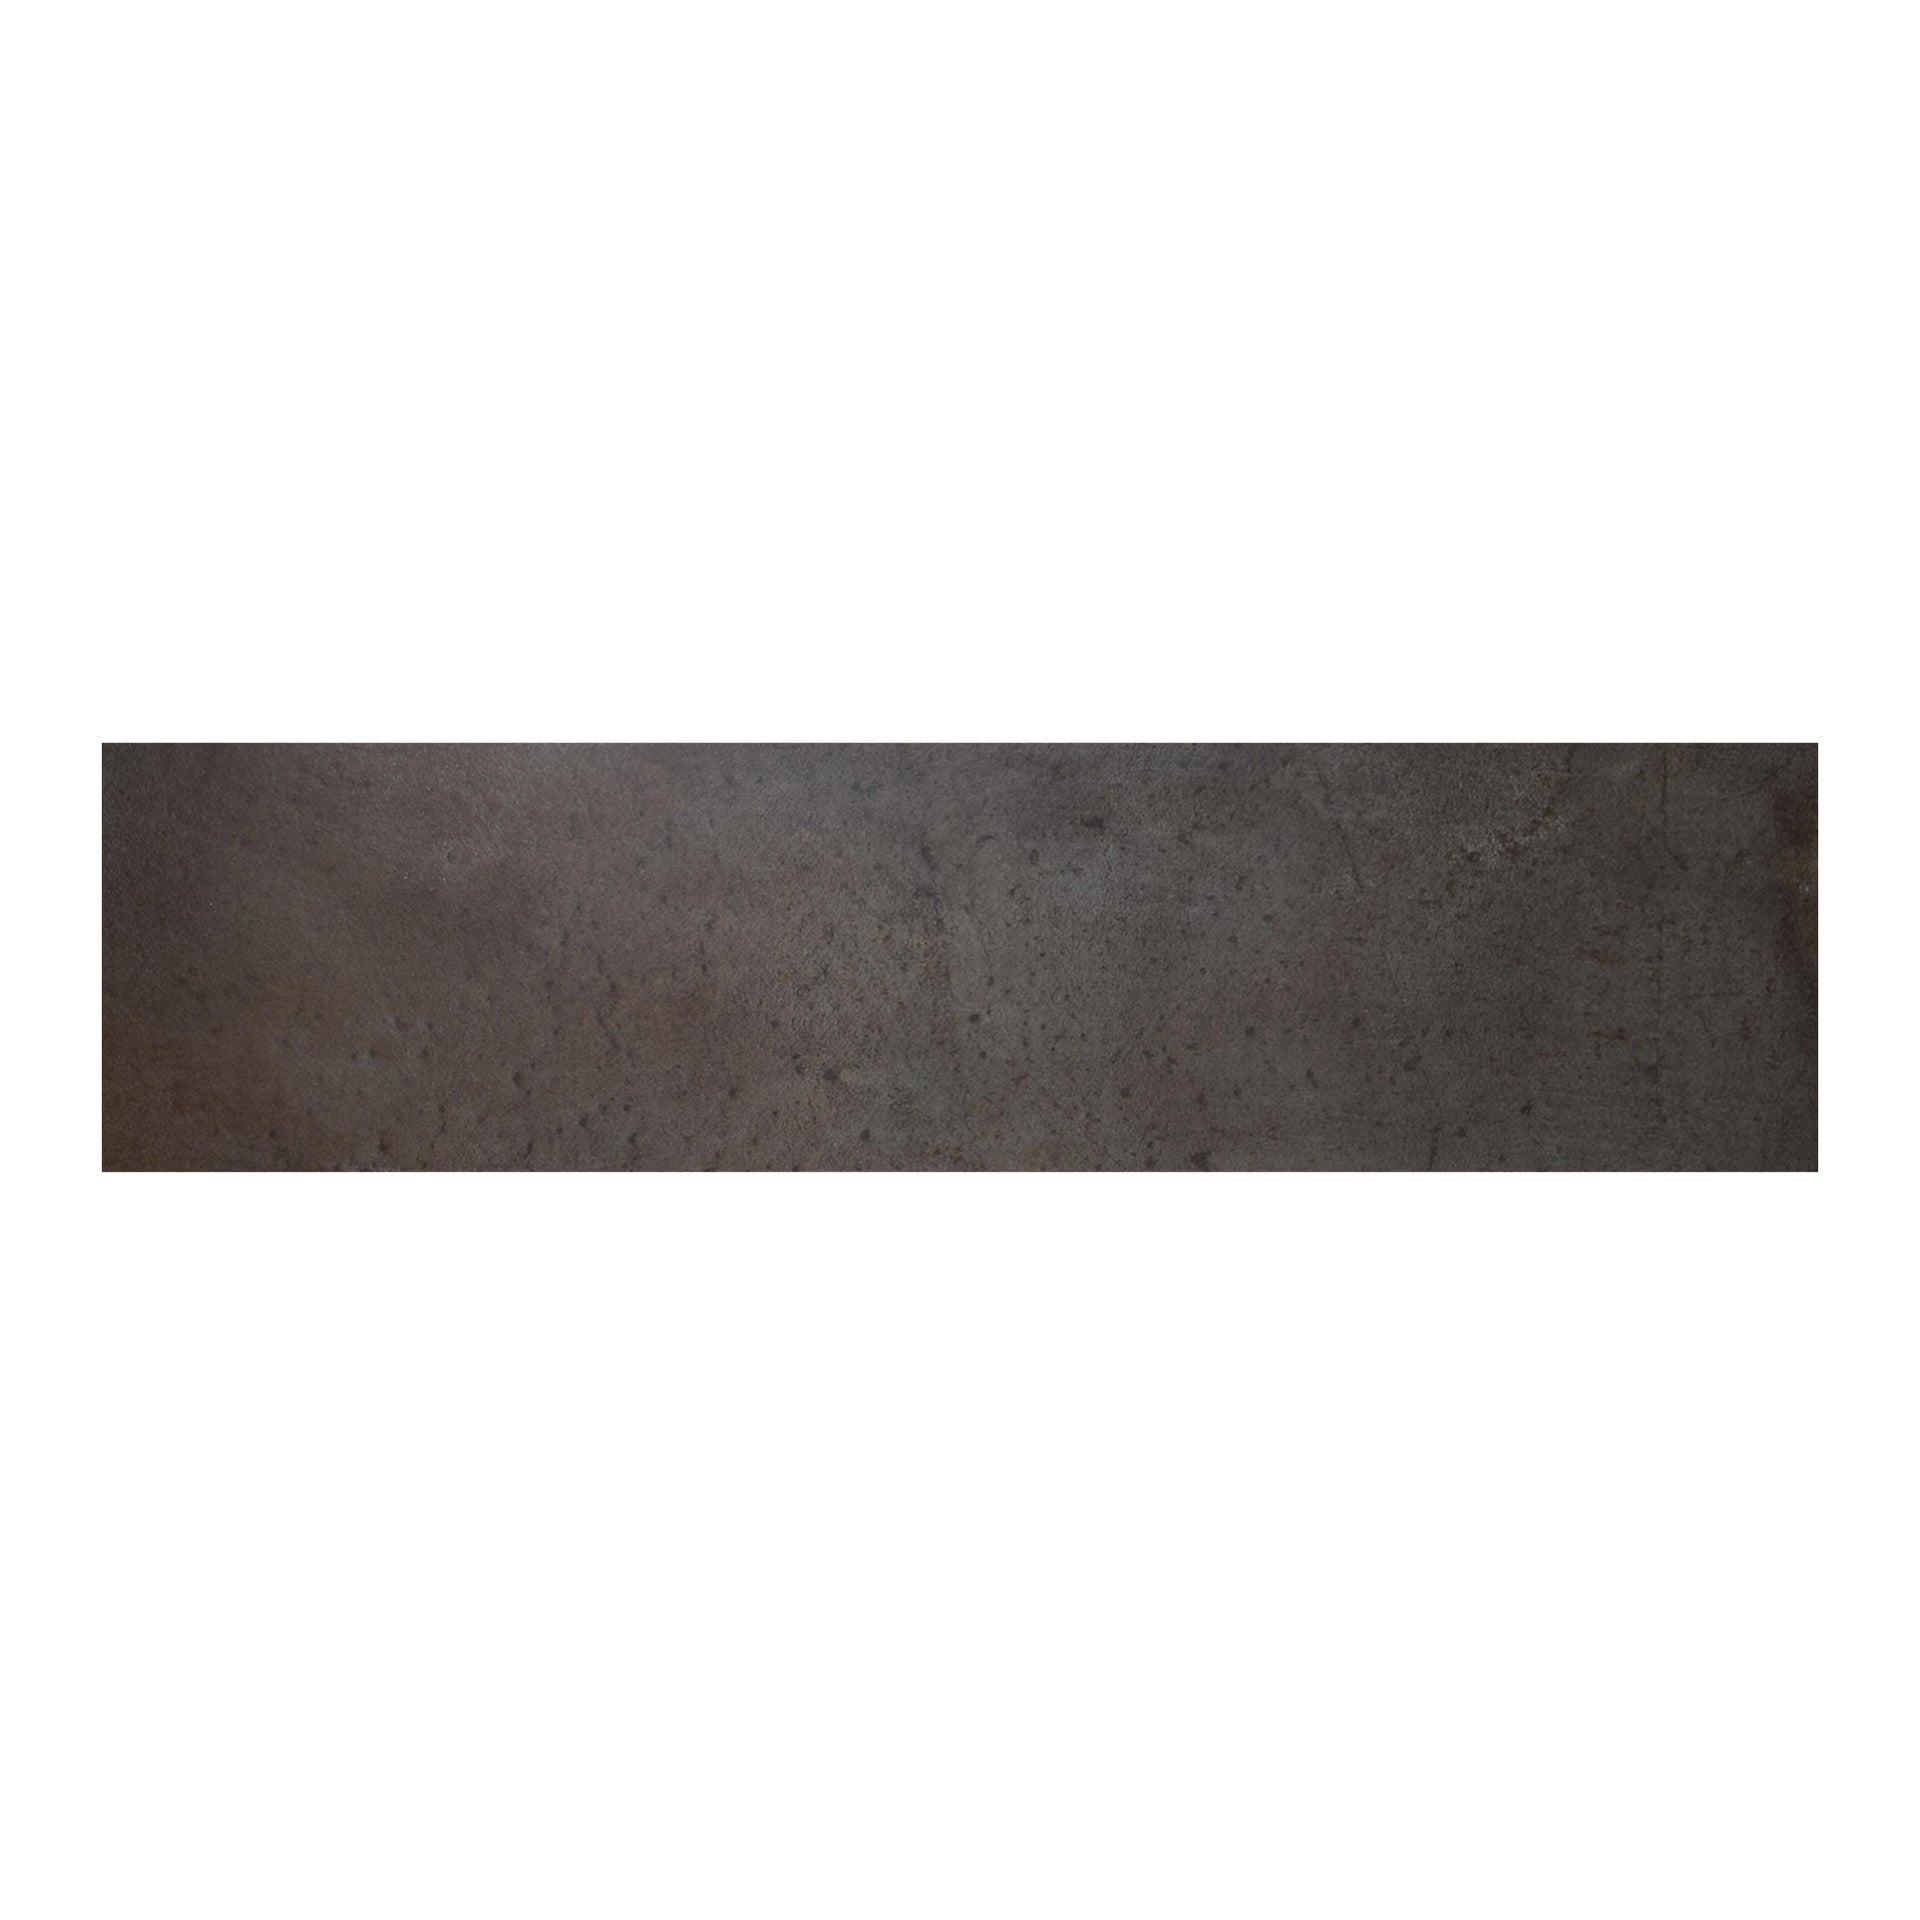 Piastrella Metal 30 x 120 cm sp. 9 mm PEI 3/5 bronzo